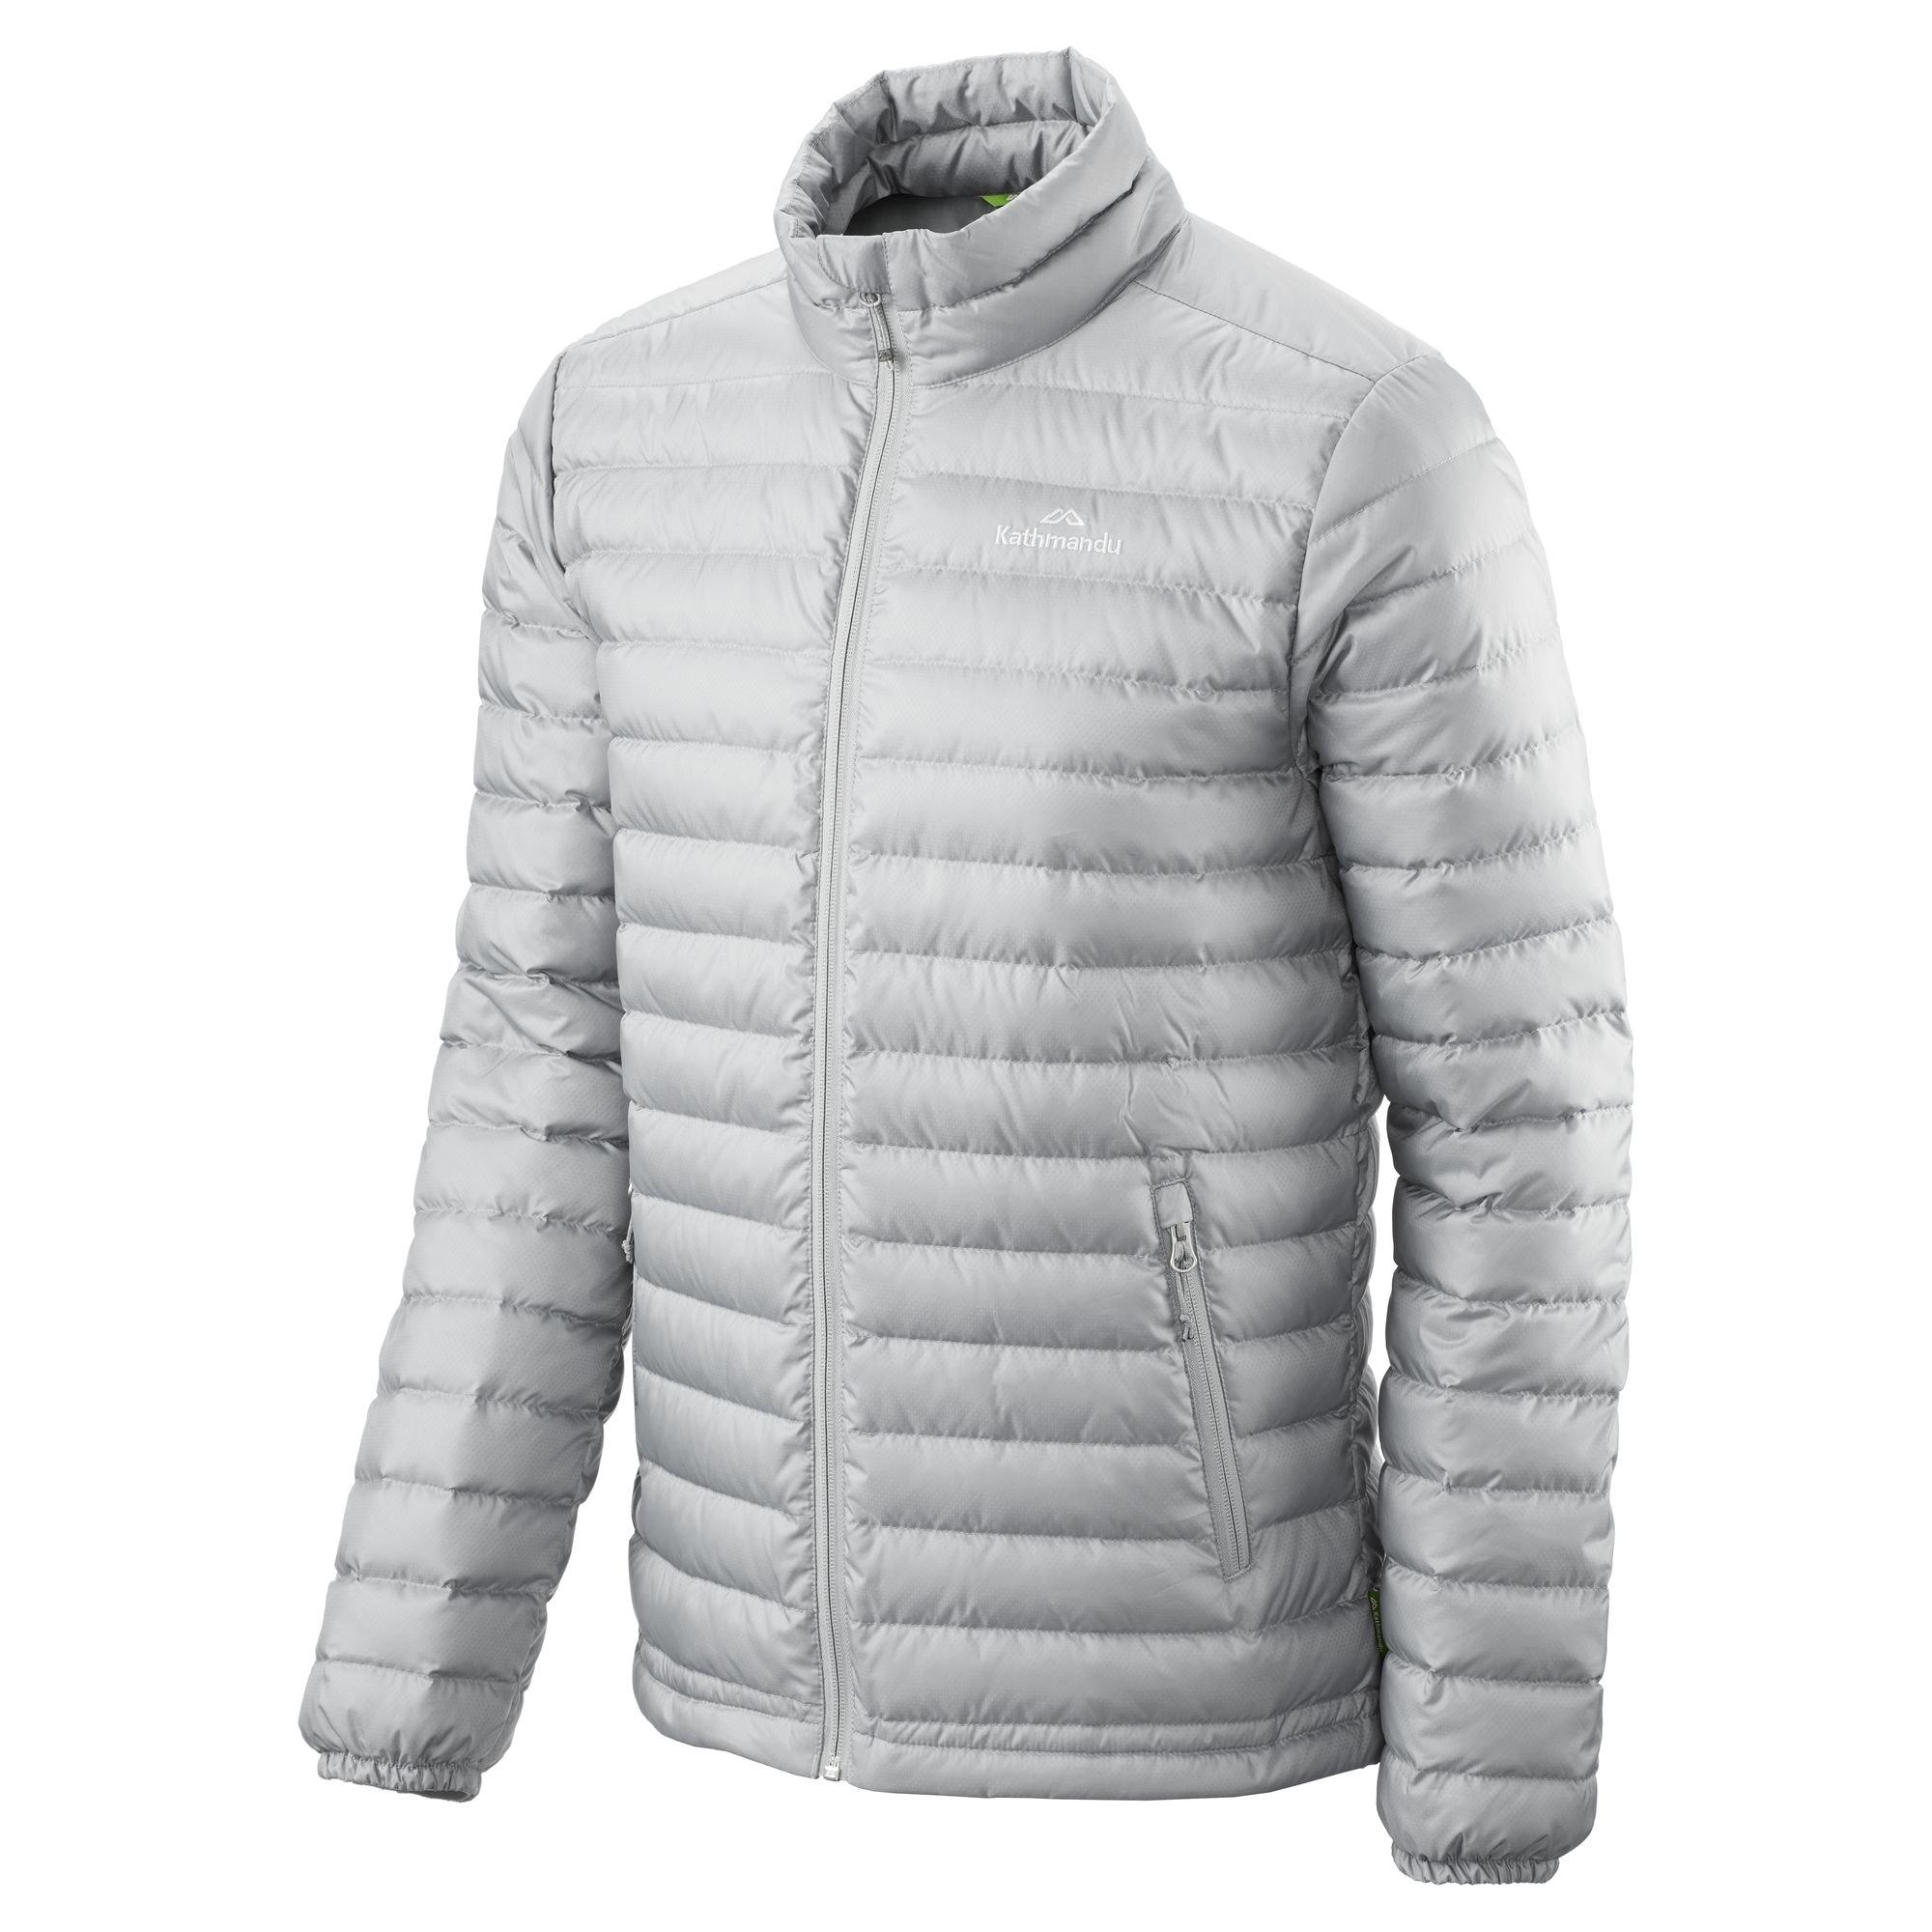 NEW-Kathmandu-Heli-Men-039-s-Lightweight-Duck-Down-Coat-Warm-Puffer-Jacket-v2 thumbnail 24